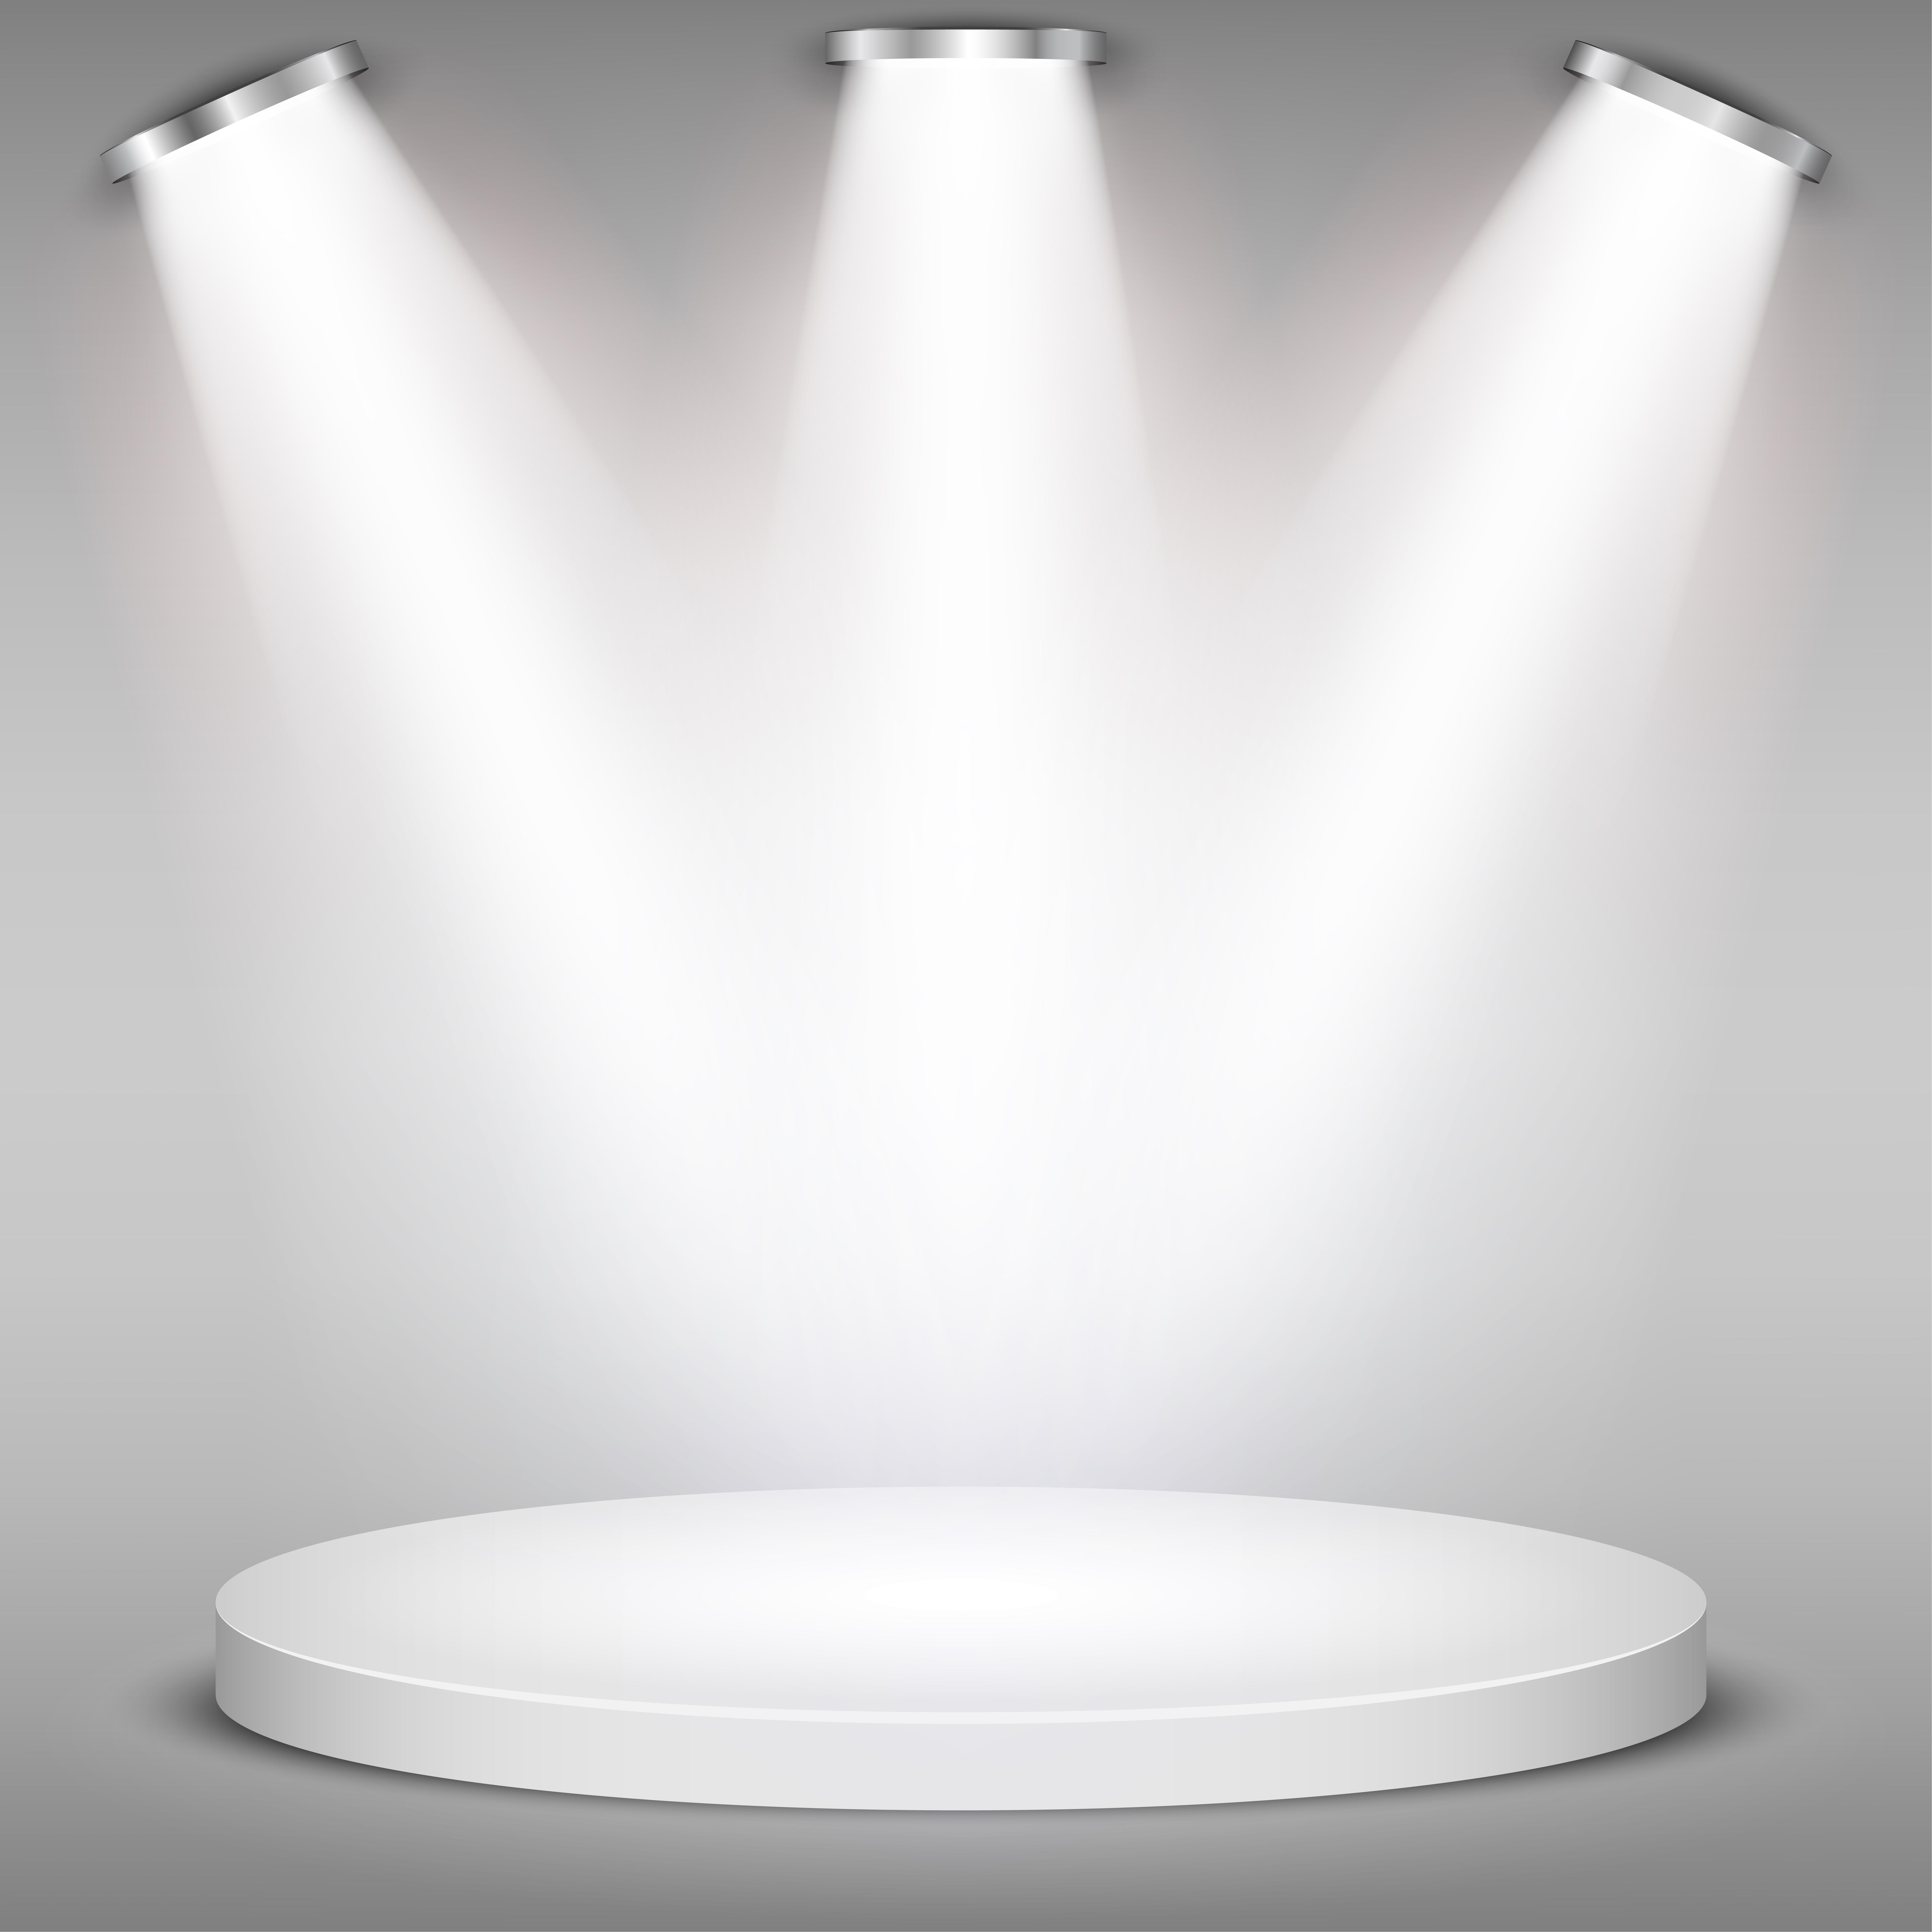 White Studio Background With Podium: White Round Winner Podium On Gray Background. Stage With